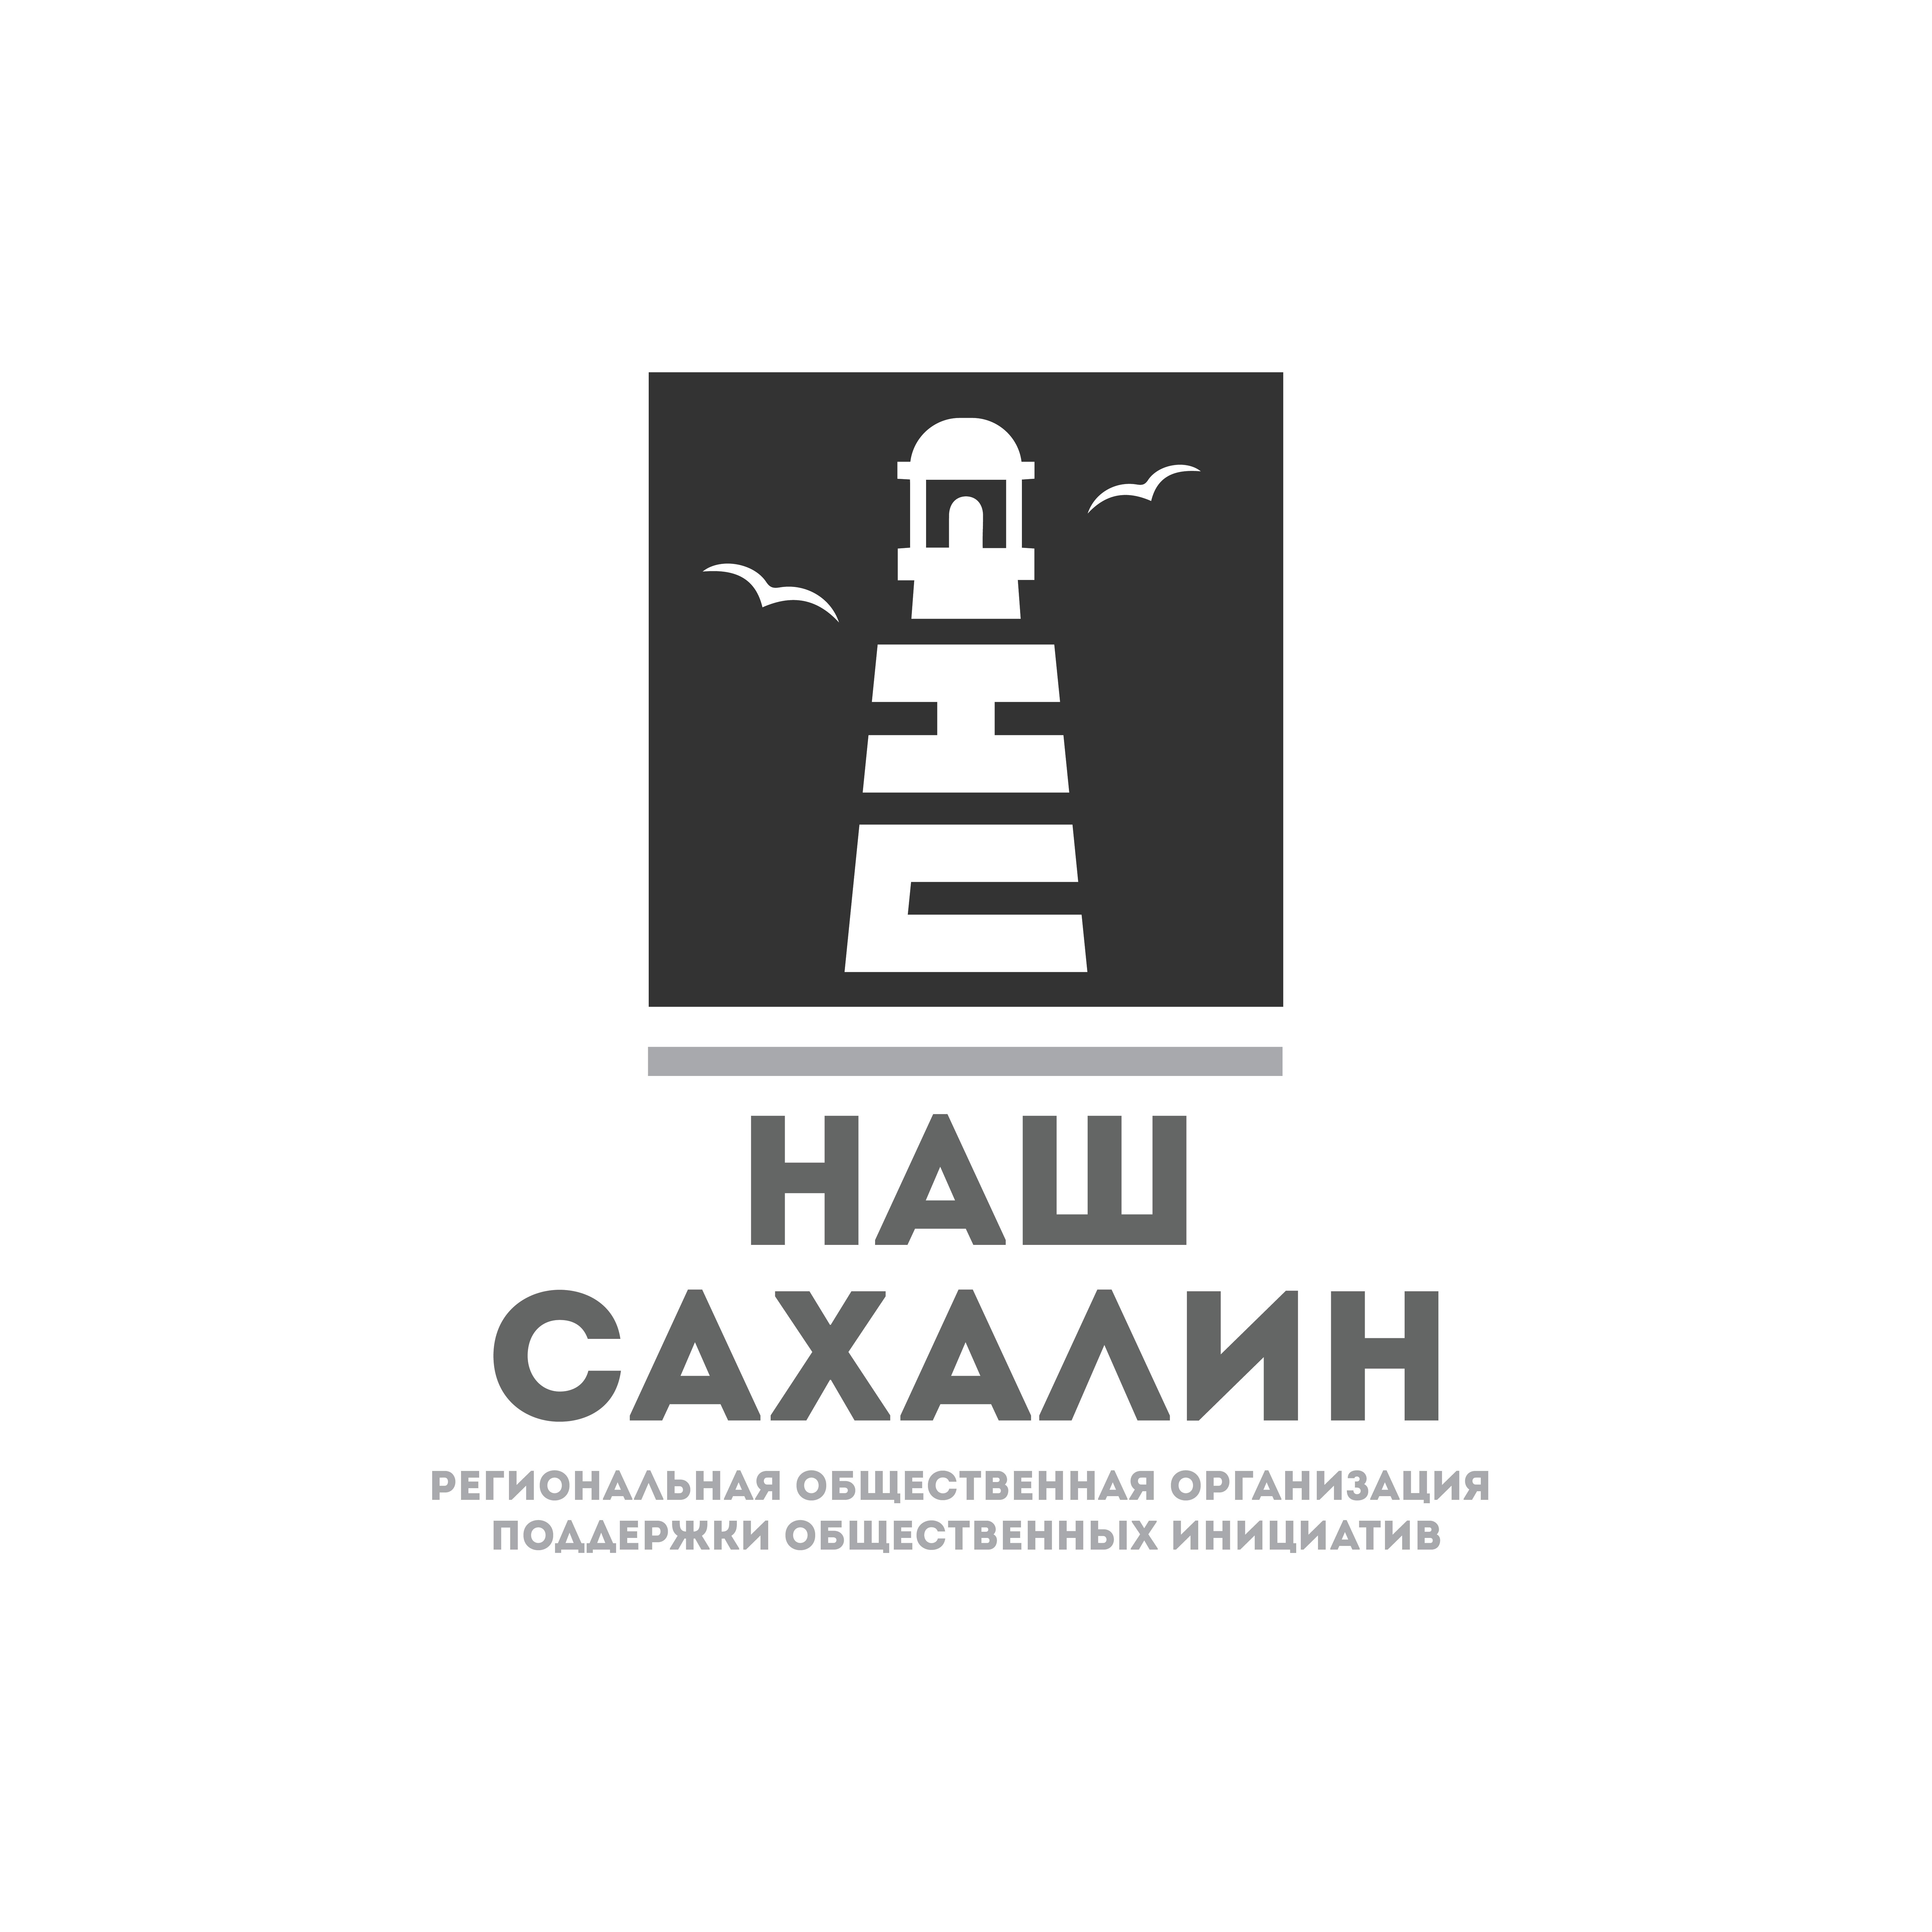 "Логотип для некоммерческой организации ""Наш Сахалин"" фото f_4395a83afd24e62b.jpg"